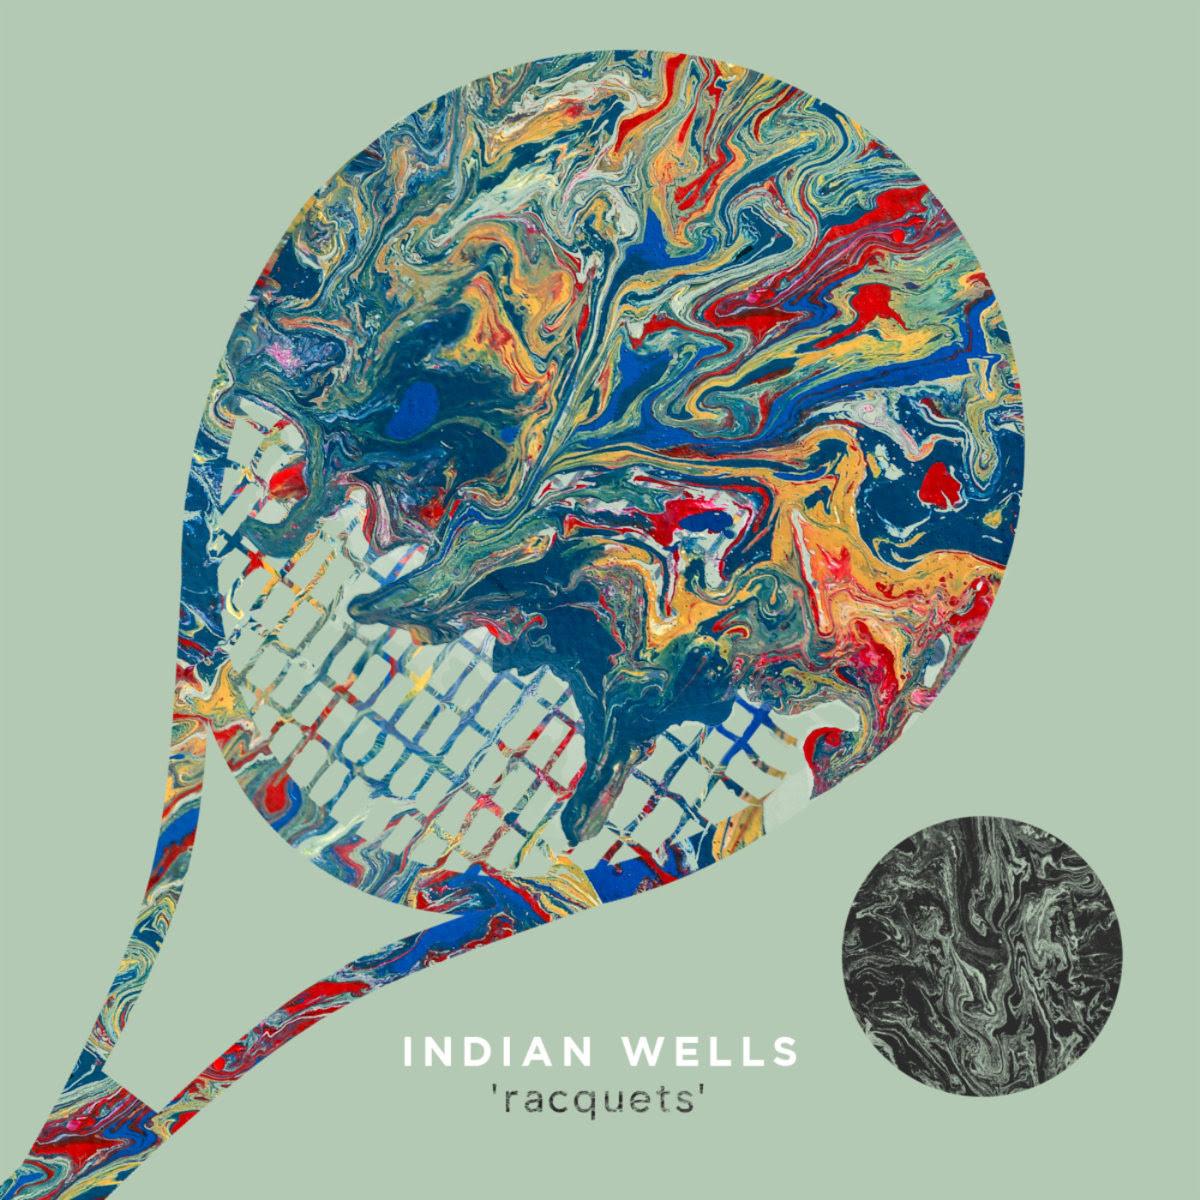 indianwells-racquets